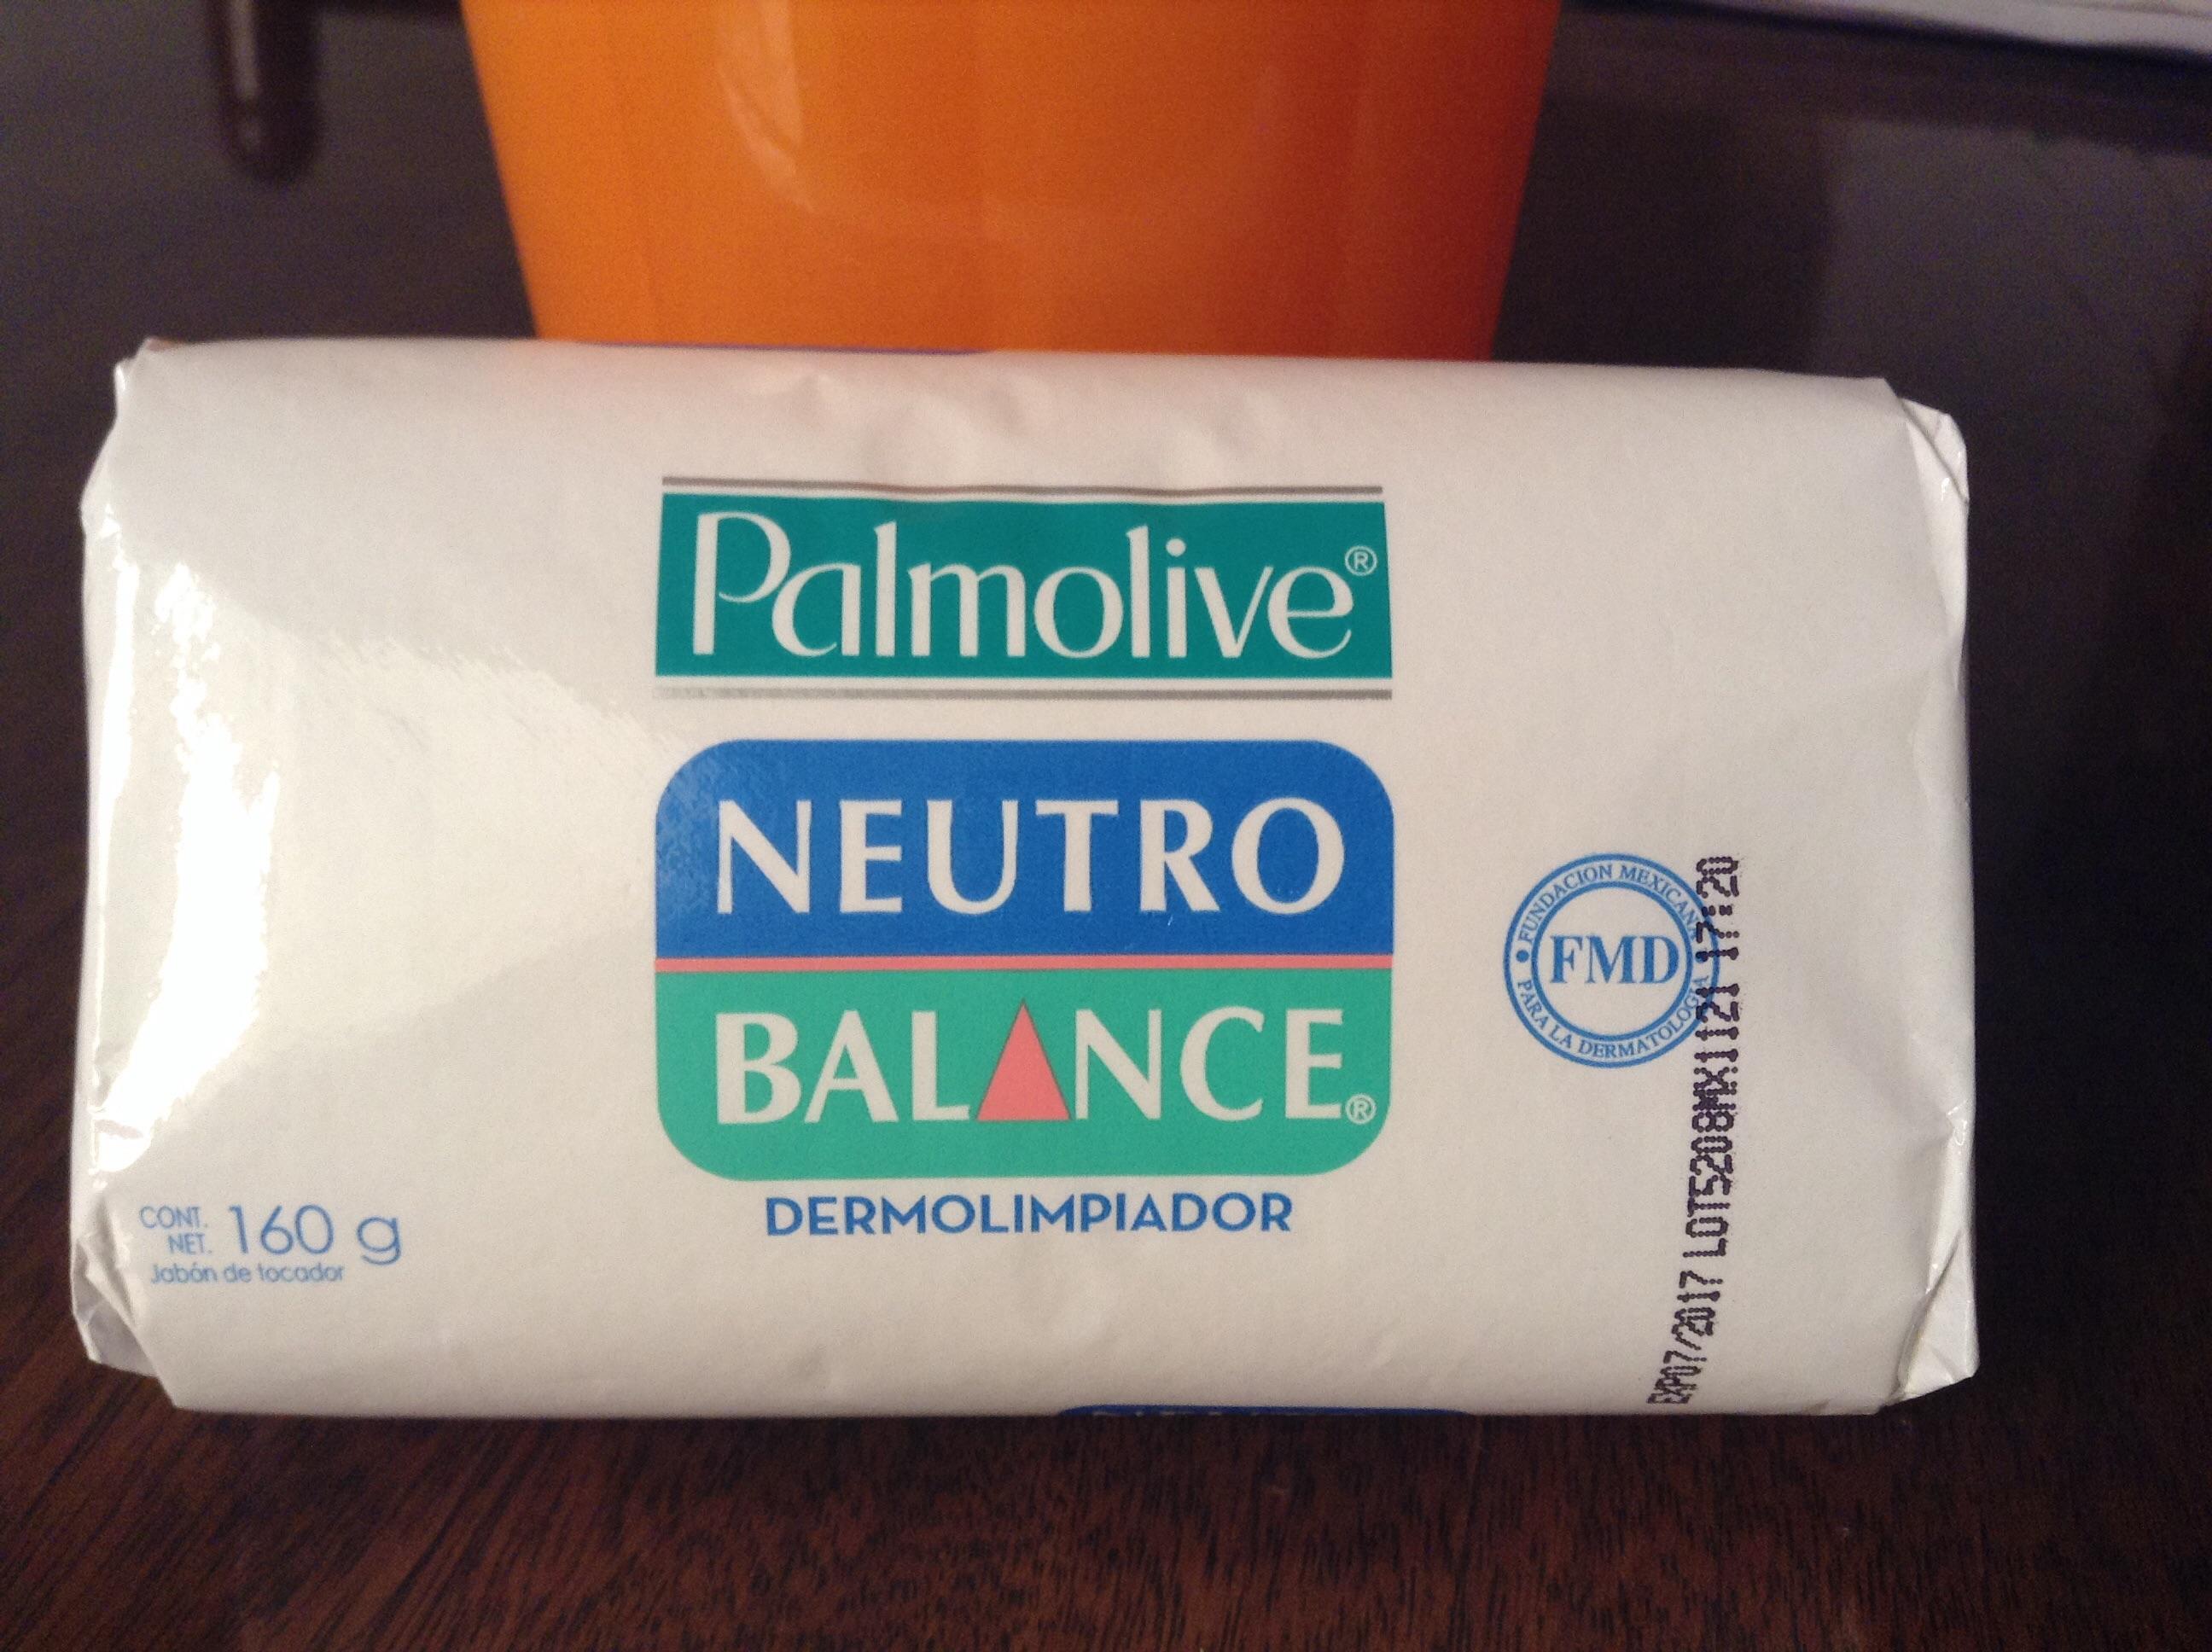 Bodega Aurrerá: Palmolive Neutro Balance DERMOLIMPIADOR $7